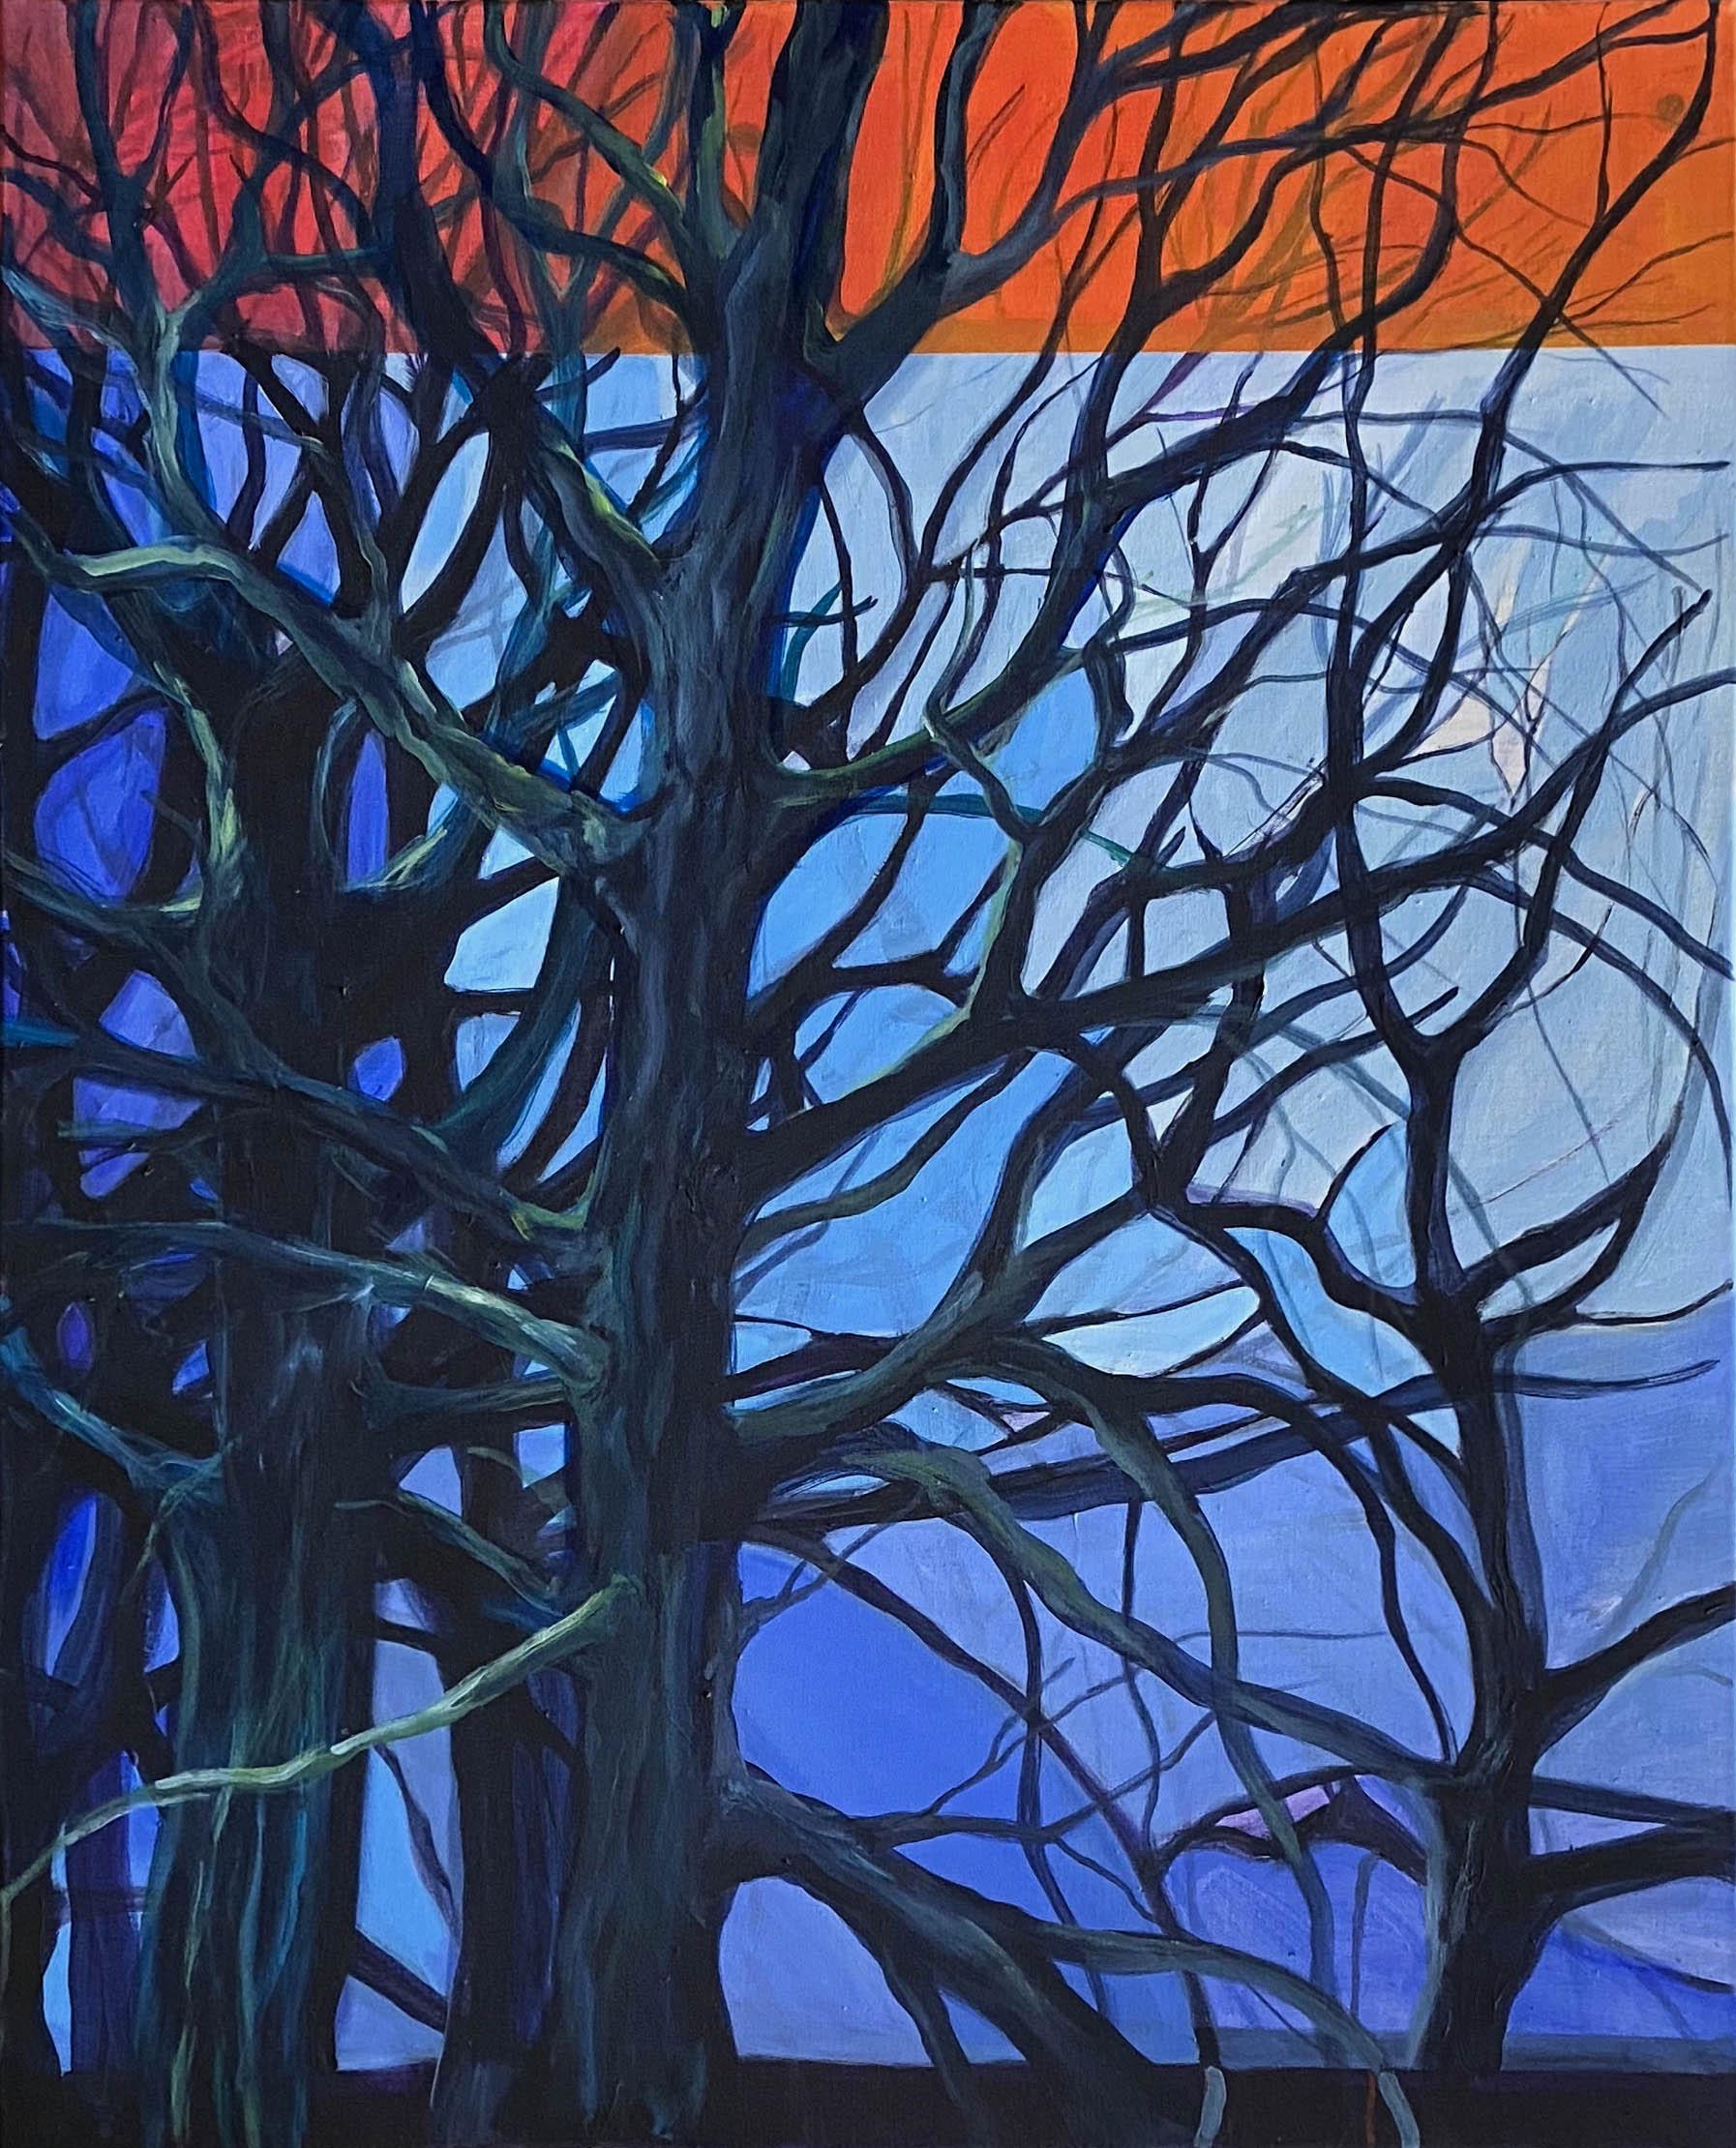 Drzewa (2021)